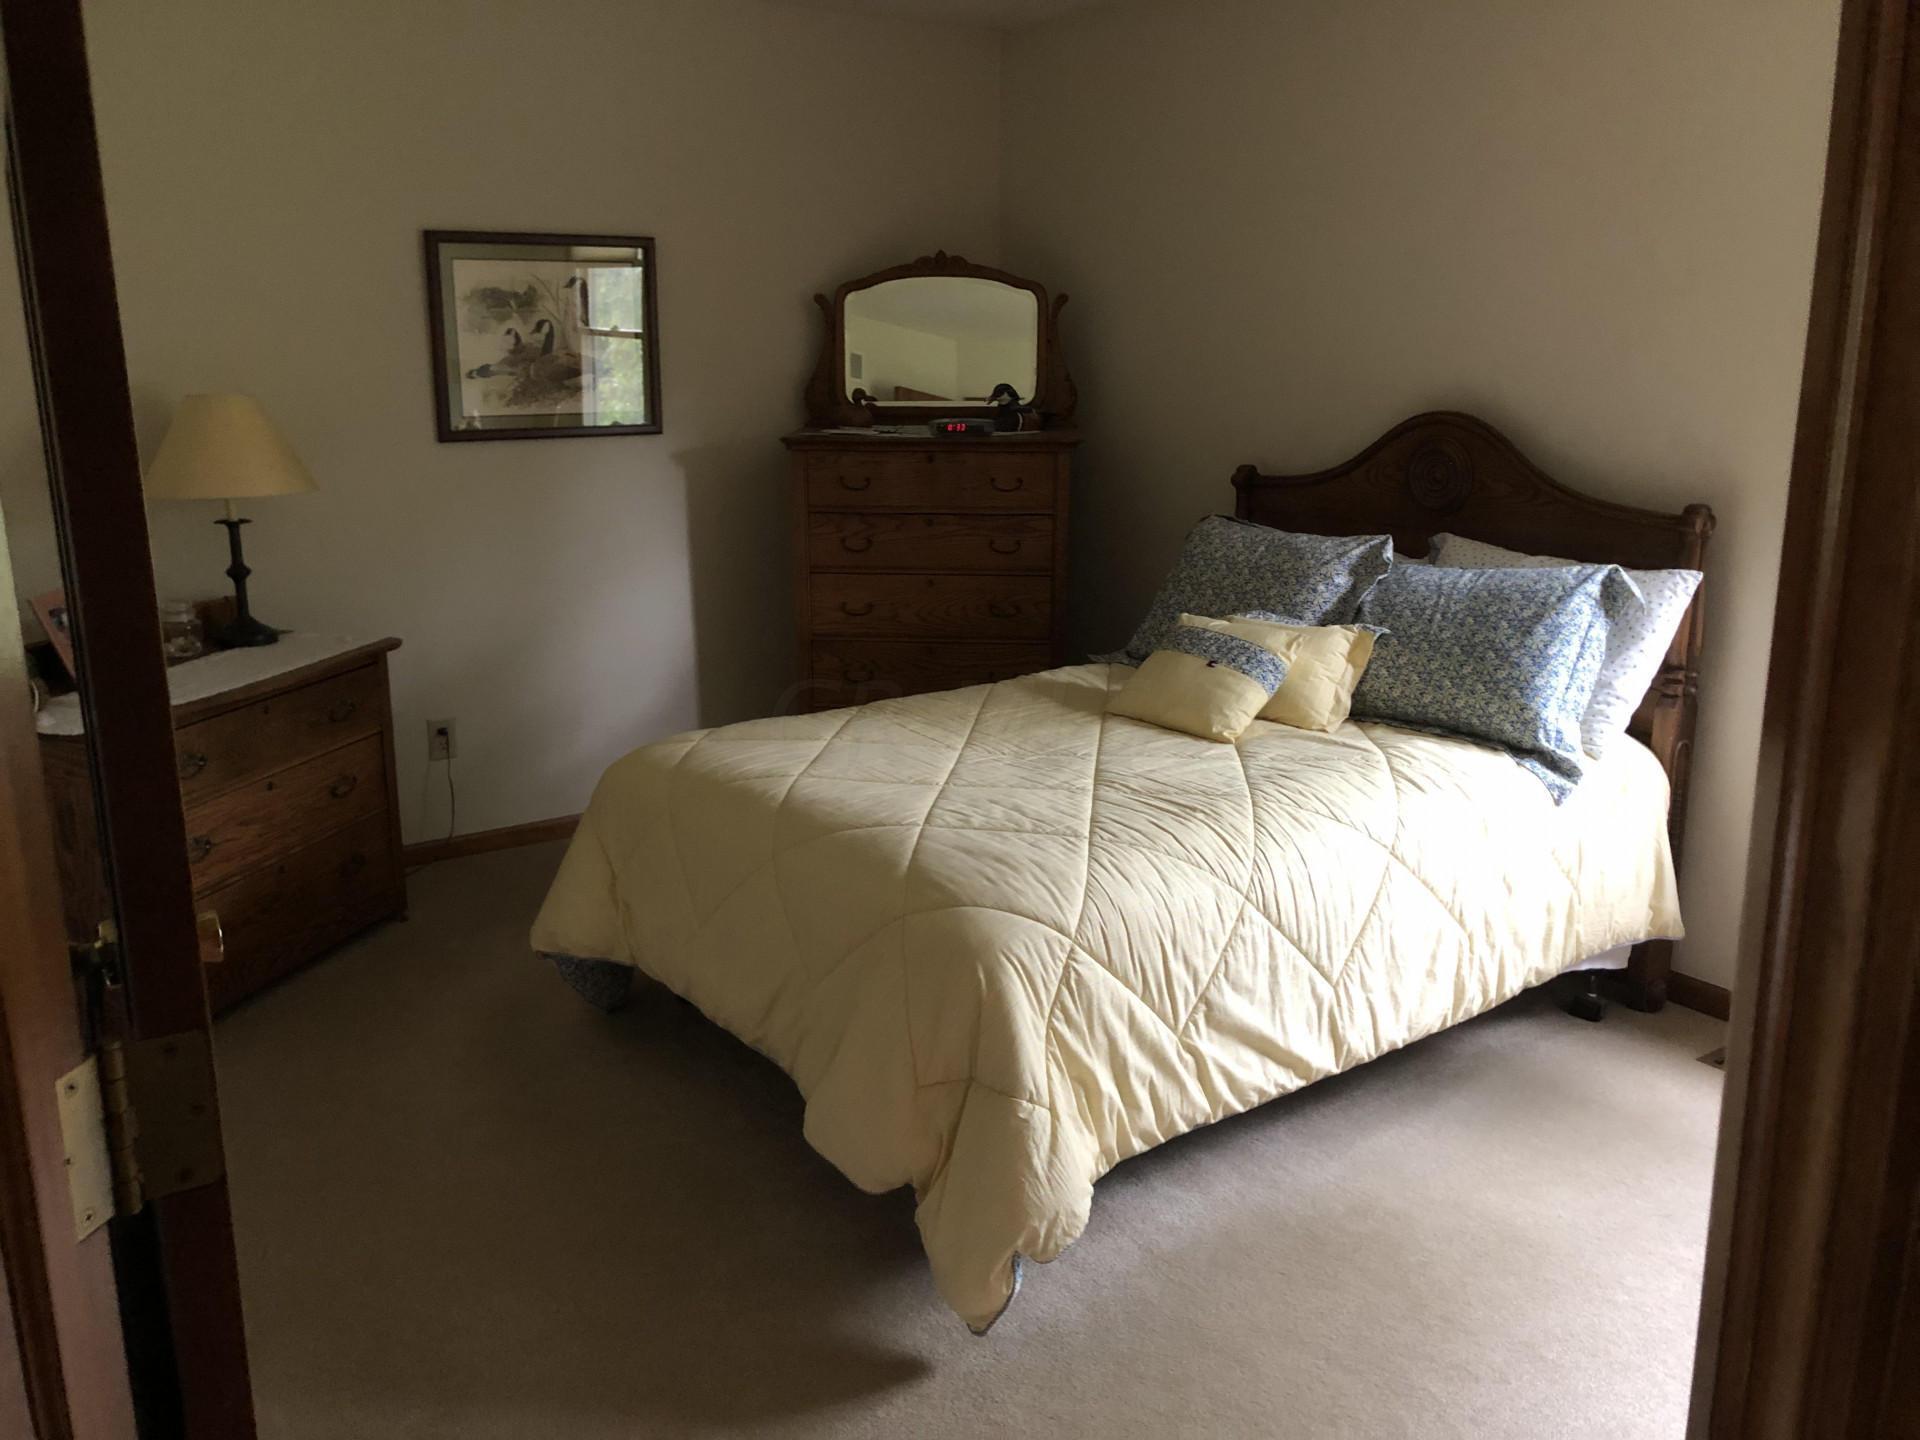 7667 Earlston Court, Dublin, Ohio 43017, 4 Bedrooms Bedrooms, ,3 BathroomsBathrooms,Residential,For Sale,Earlston,220025467